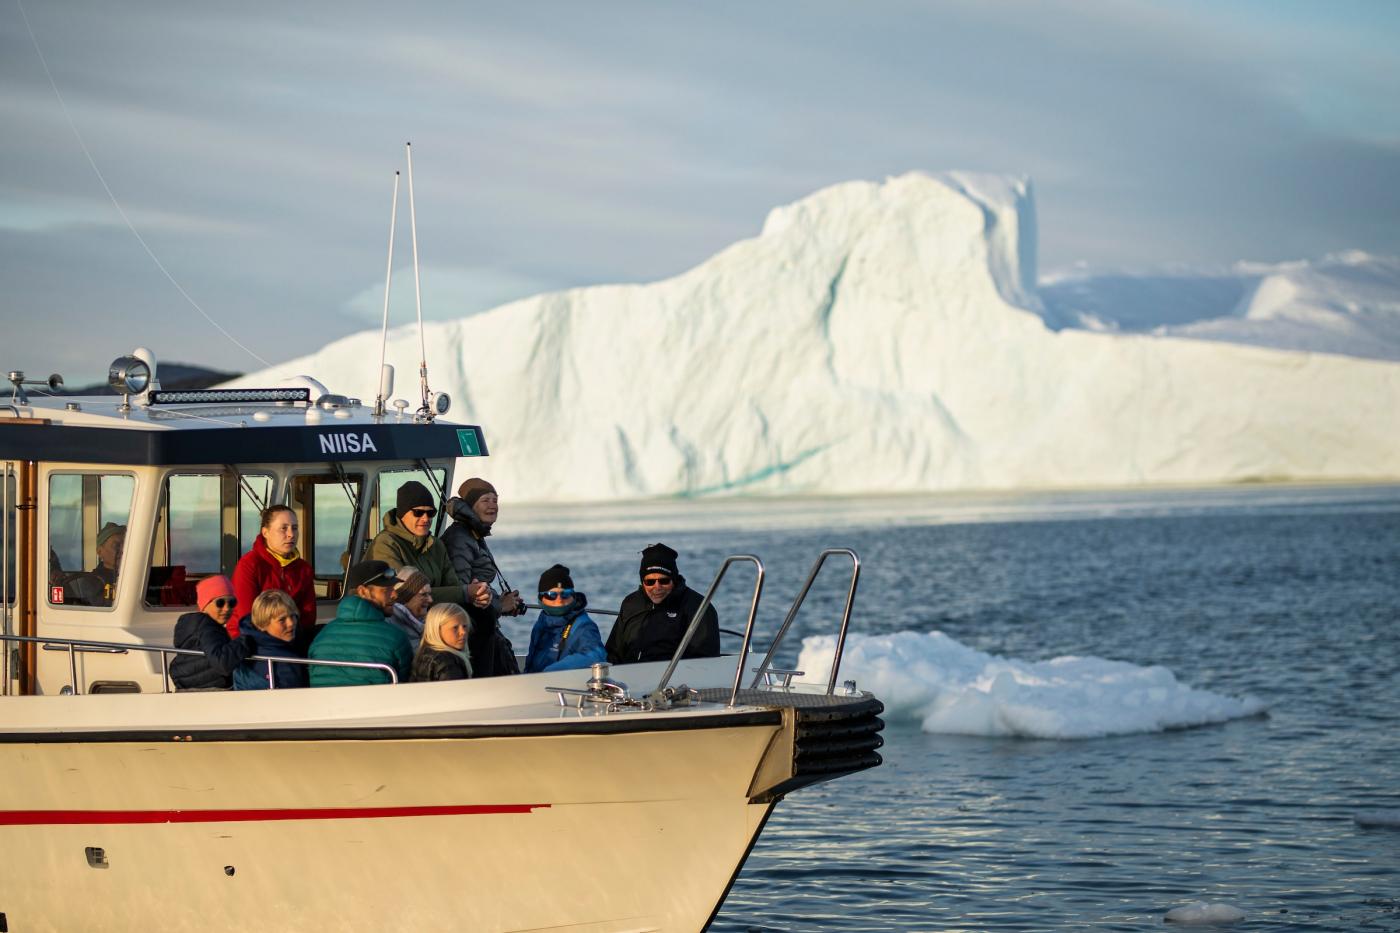 Touring Around Ice, Ilulissat. Aningaaq Rosing Carlsen - Visit Greenland